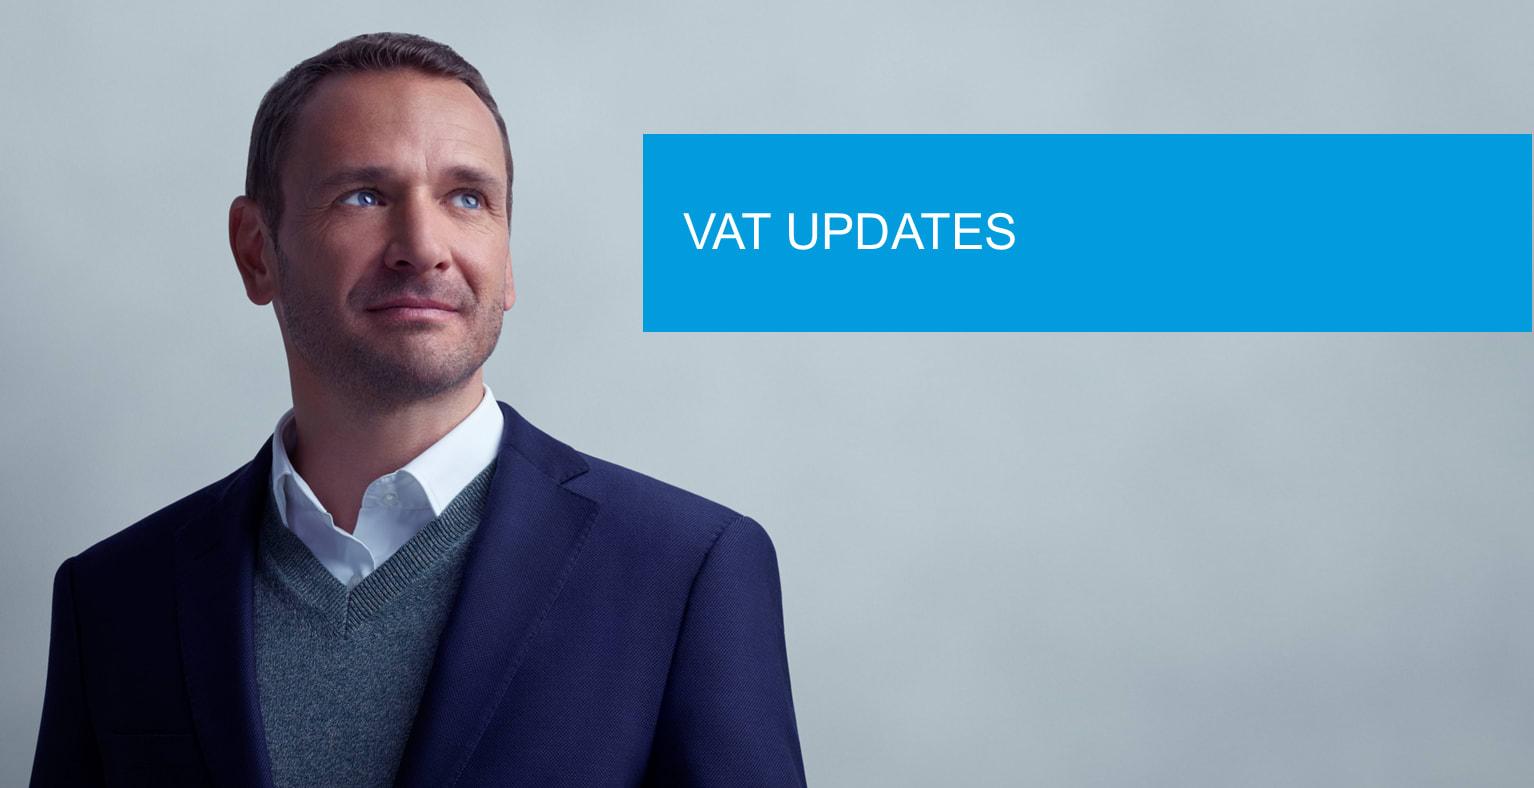 vat updates 4.png